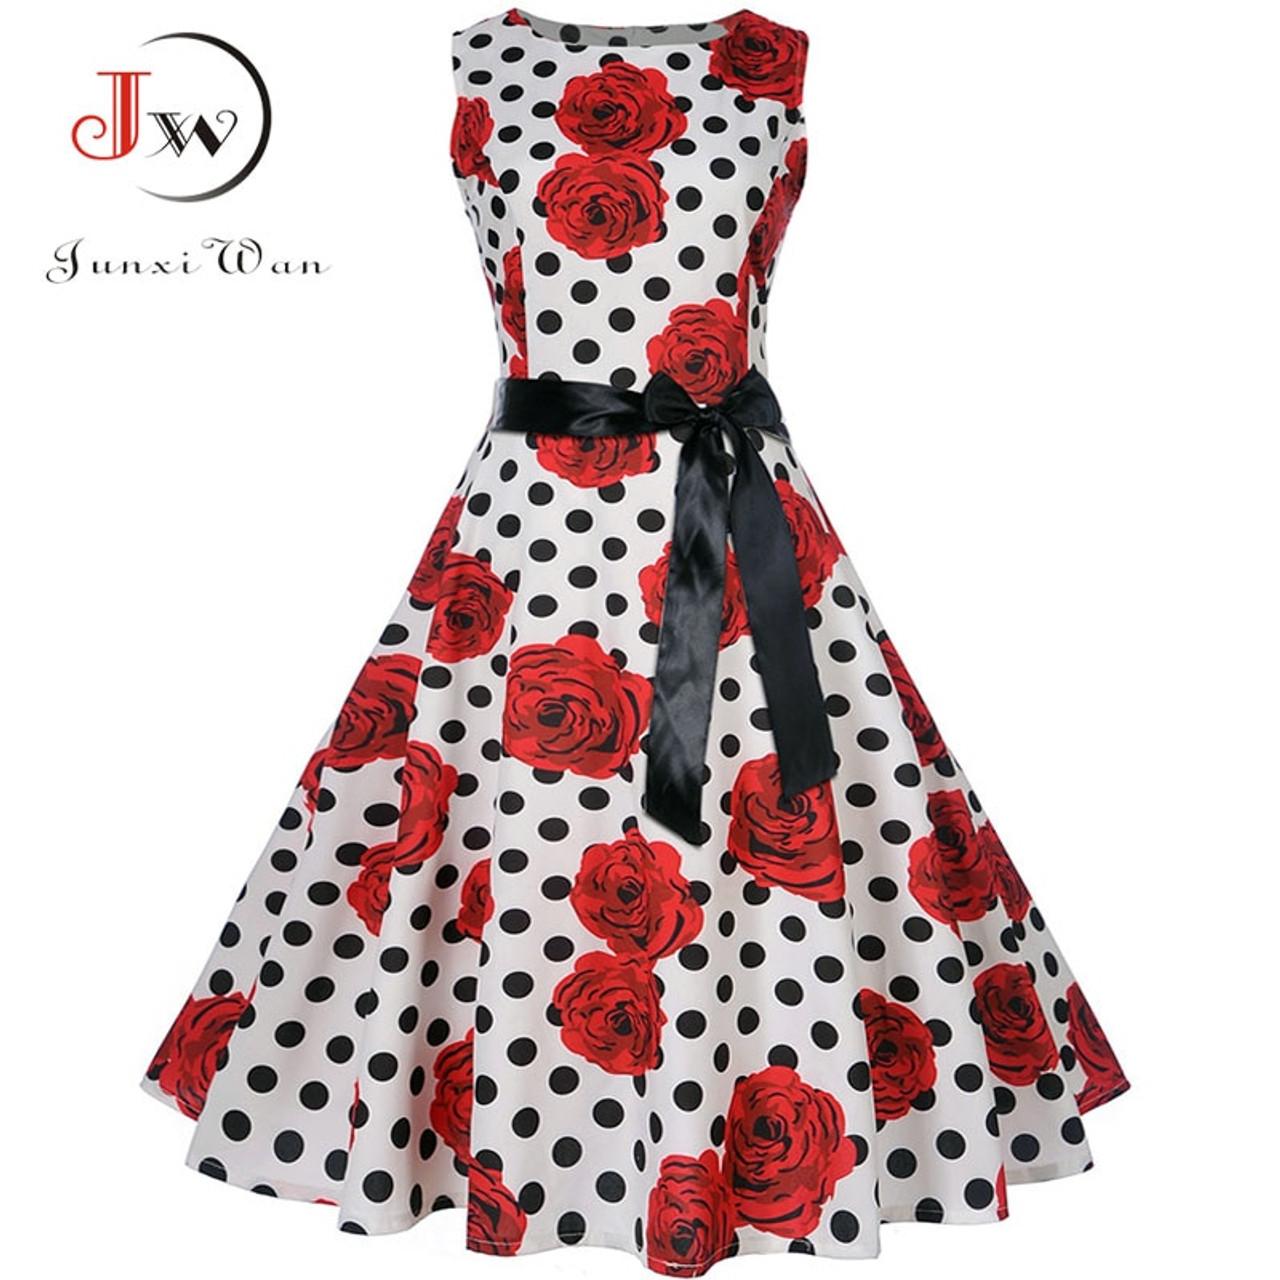 b9e3b31dc02 ... Plus Size Summer Dress 2018 Women Vintage Rockabilly Dresses Jurken  Floral 50s 60s Retro Big Swing